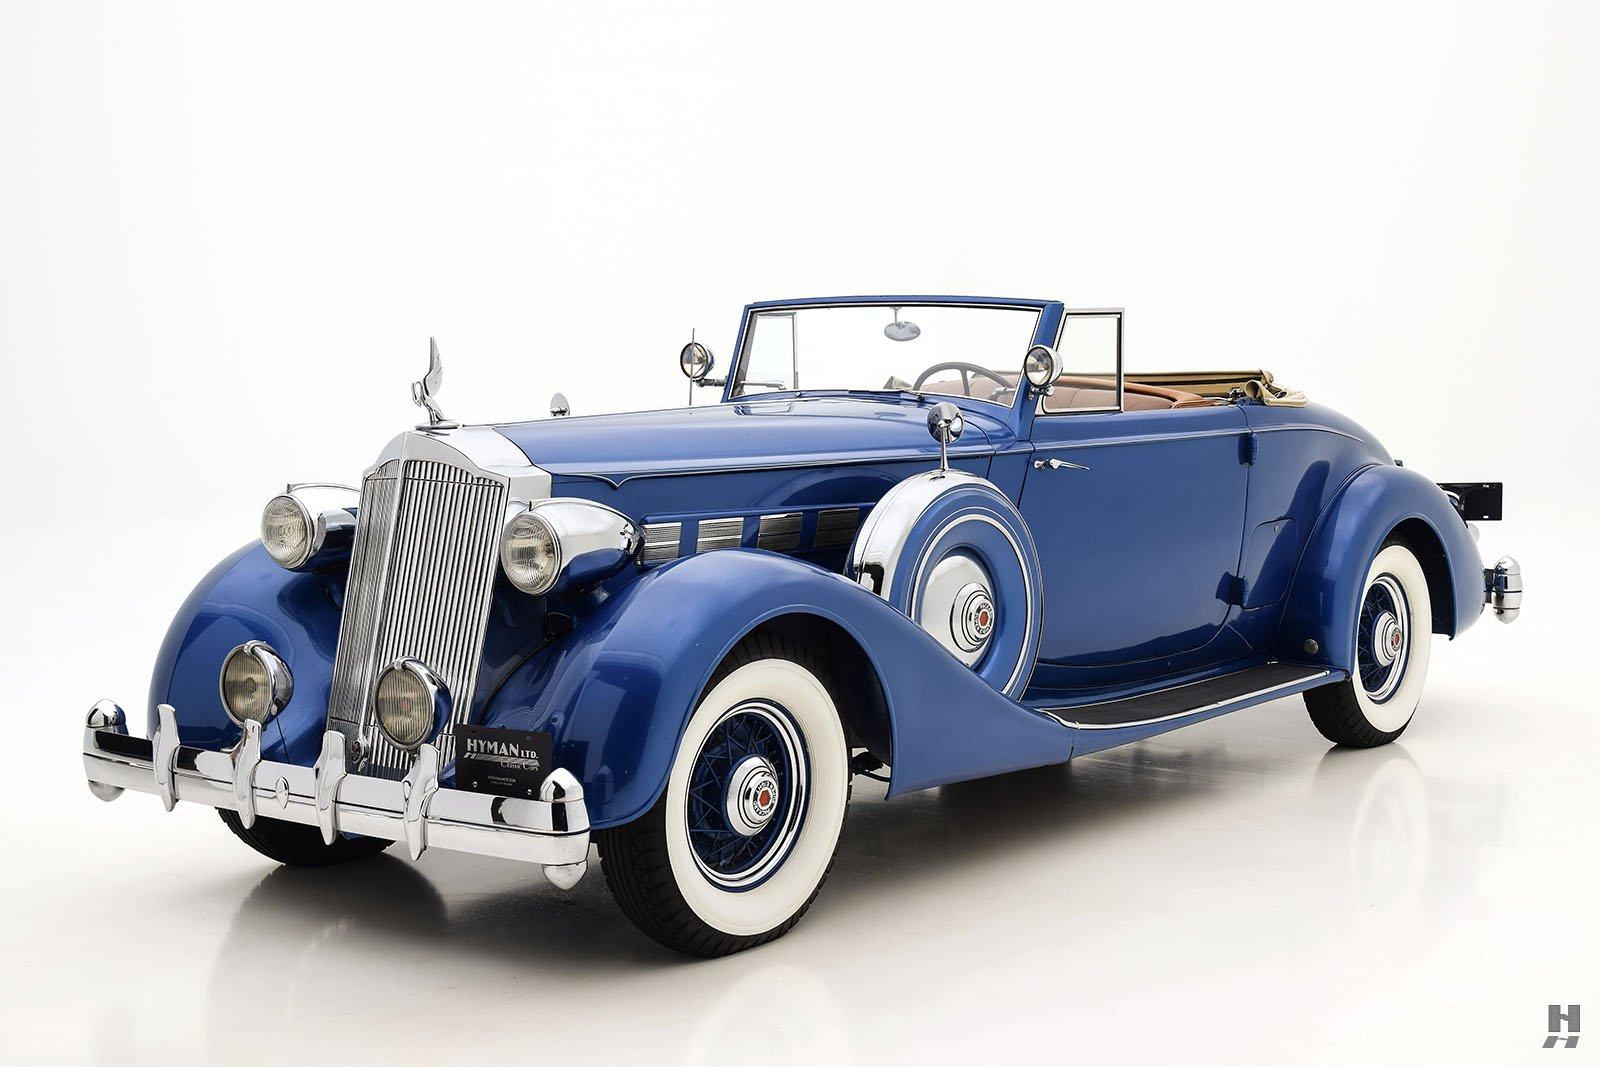 1936 Packard Super 8 Coupe Roadster | Hyman Ltd. Classic Cars